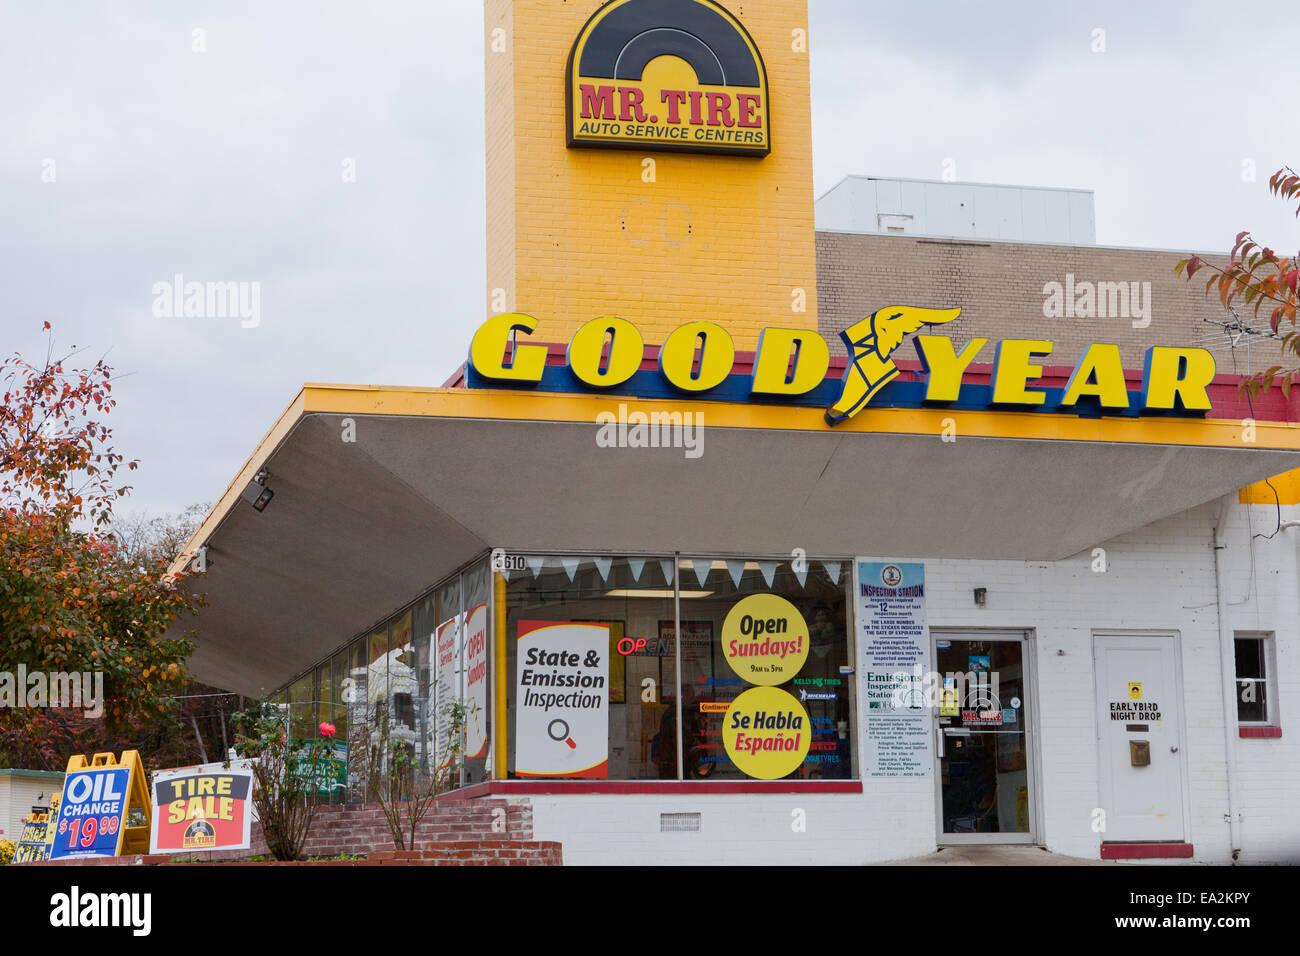 Store Search Mr Tire Auto Service Centers >> Mr Tire Storefront Virginia Usa Stock Photo 75047475 Alamy